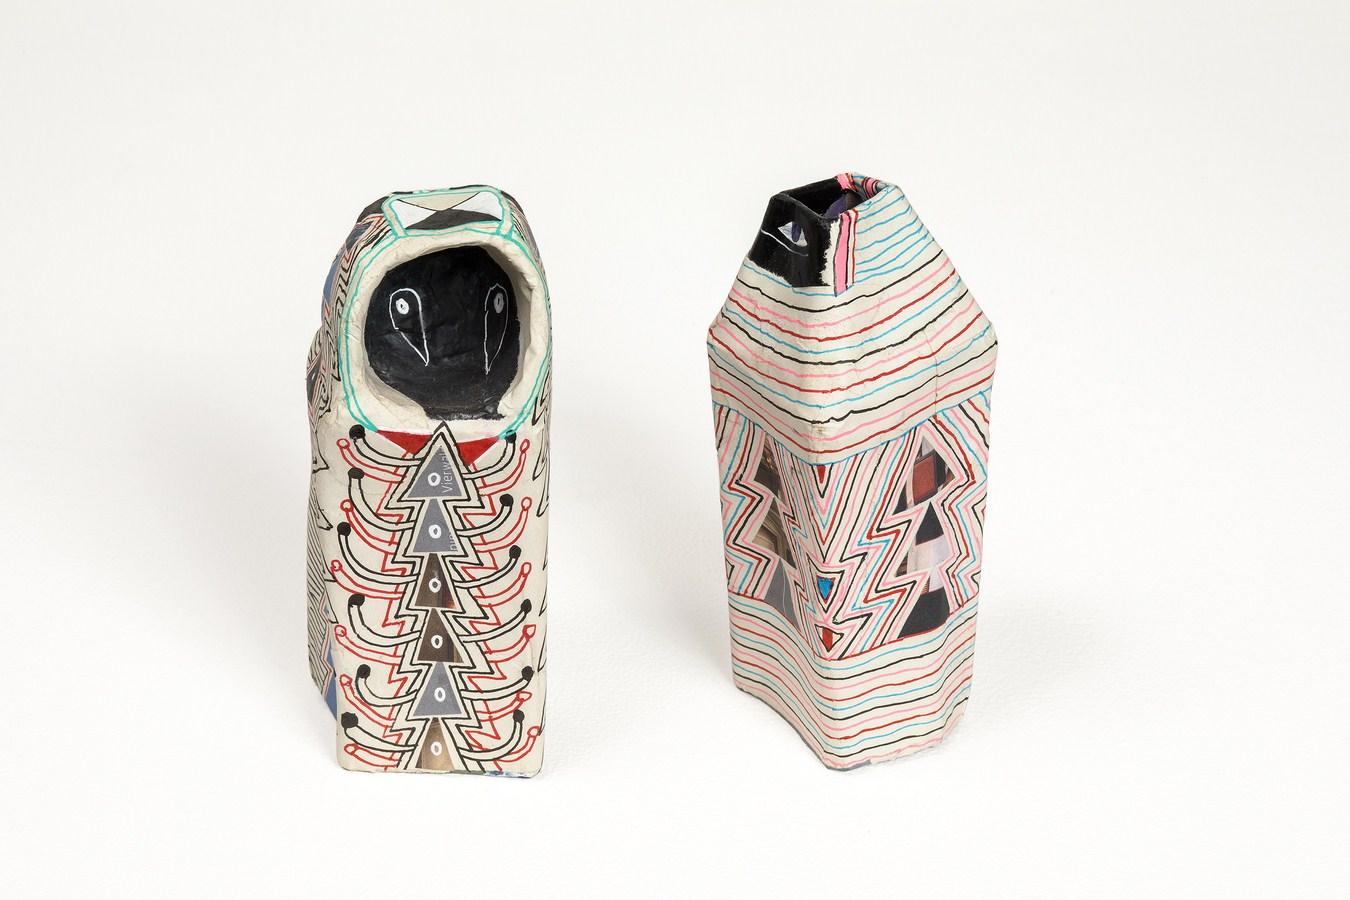 "Swiss Trash (Voodoo & Egyptology) | Paper trash, collage, pen | 2.1"" x 2.1"" x 5"" & 2"" x 2.2"" x 5.5""  | 2017"